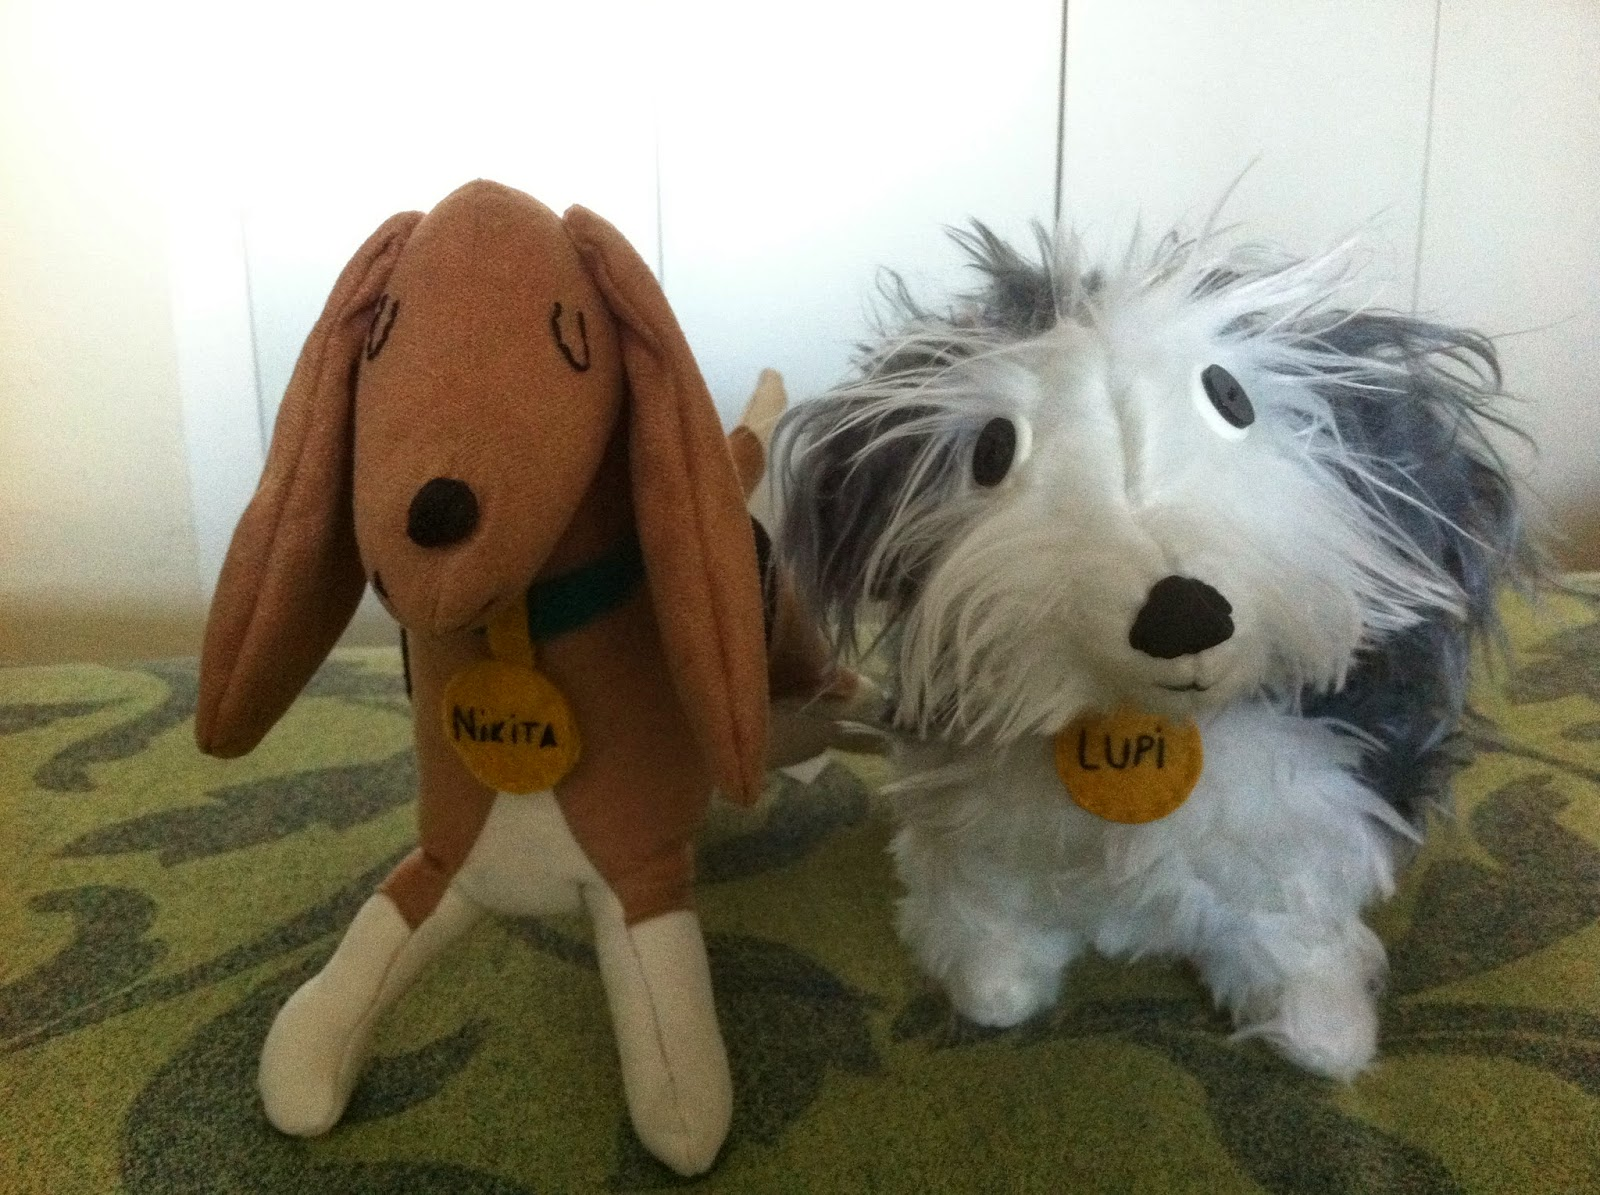 beagle muñeco personalizado customized stuffed toy mascota  perro pelo dog